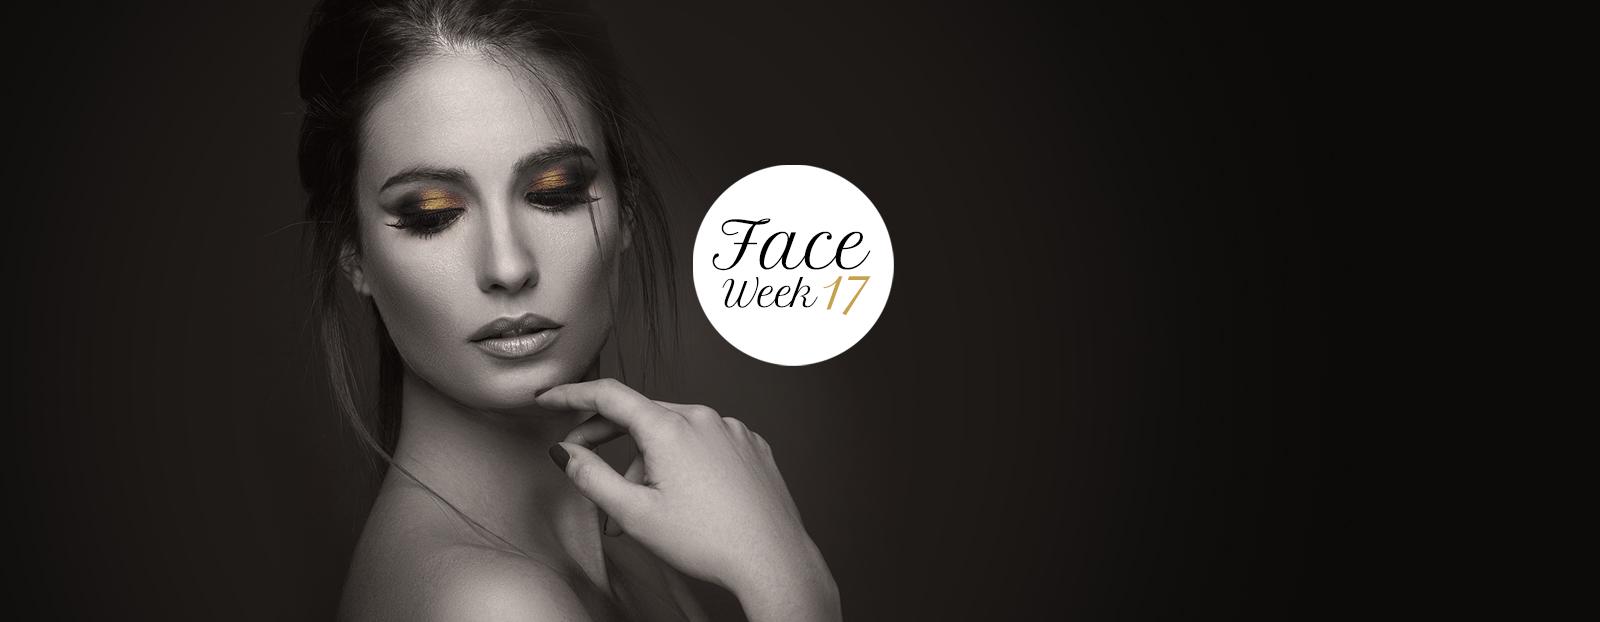 skiuma-testata-face-week